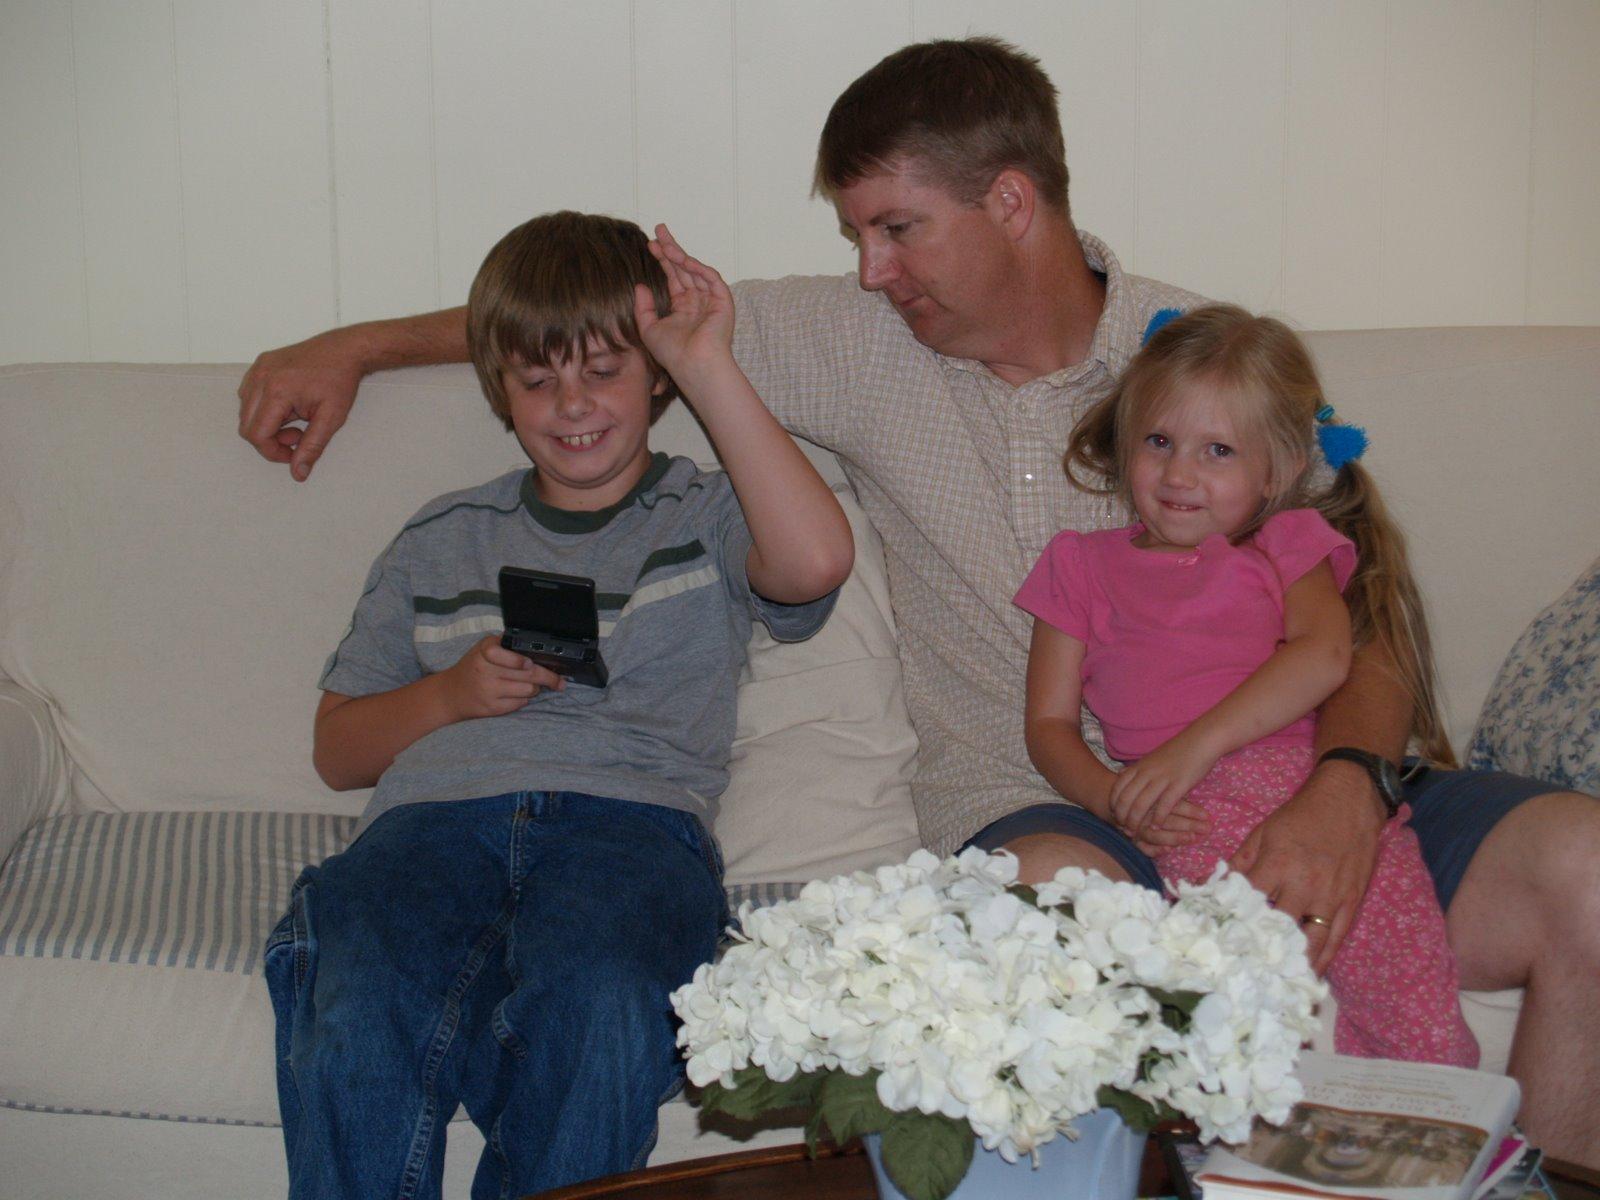 [Tom+and+Kids]